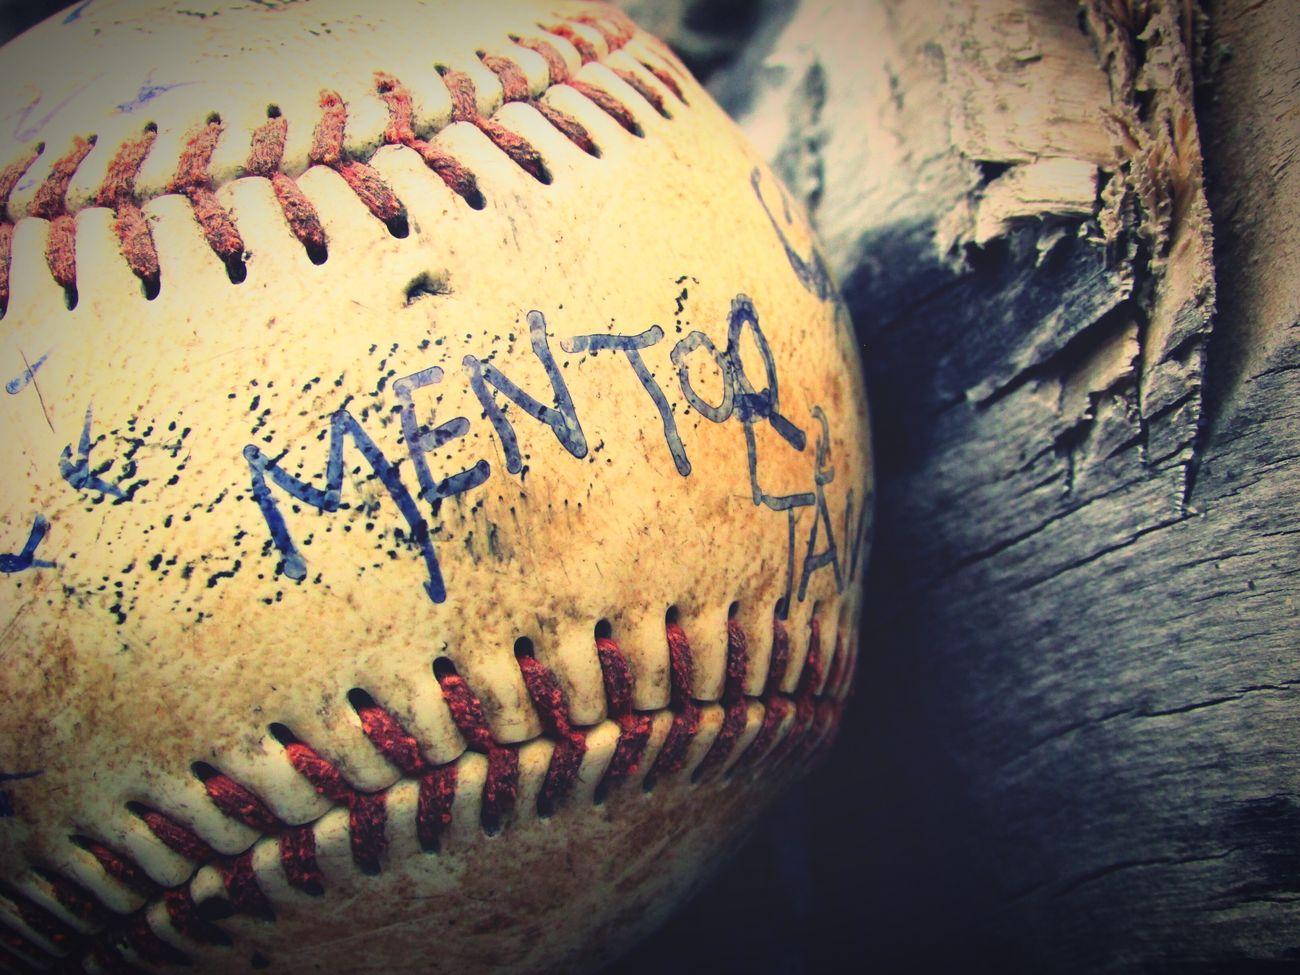 Baseball - Sport Baseball - Ball Mentor Outside Adventure Outdoors Hiking Serendipity ➰ Hikingadventures Summer Woods Day No People Baseball Canada